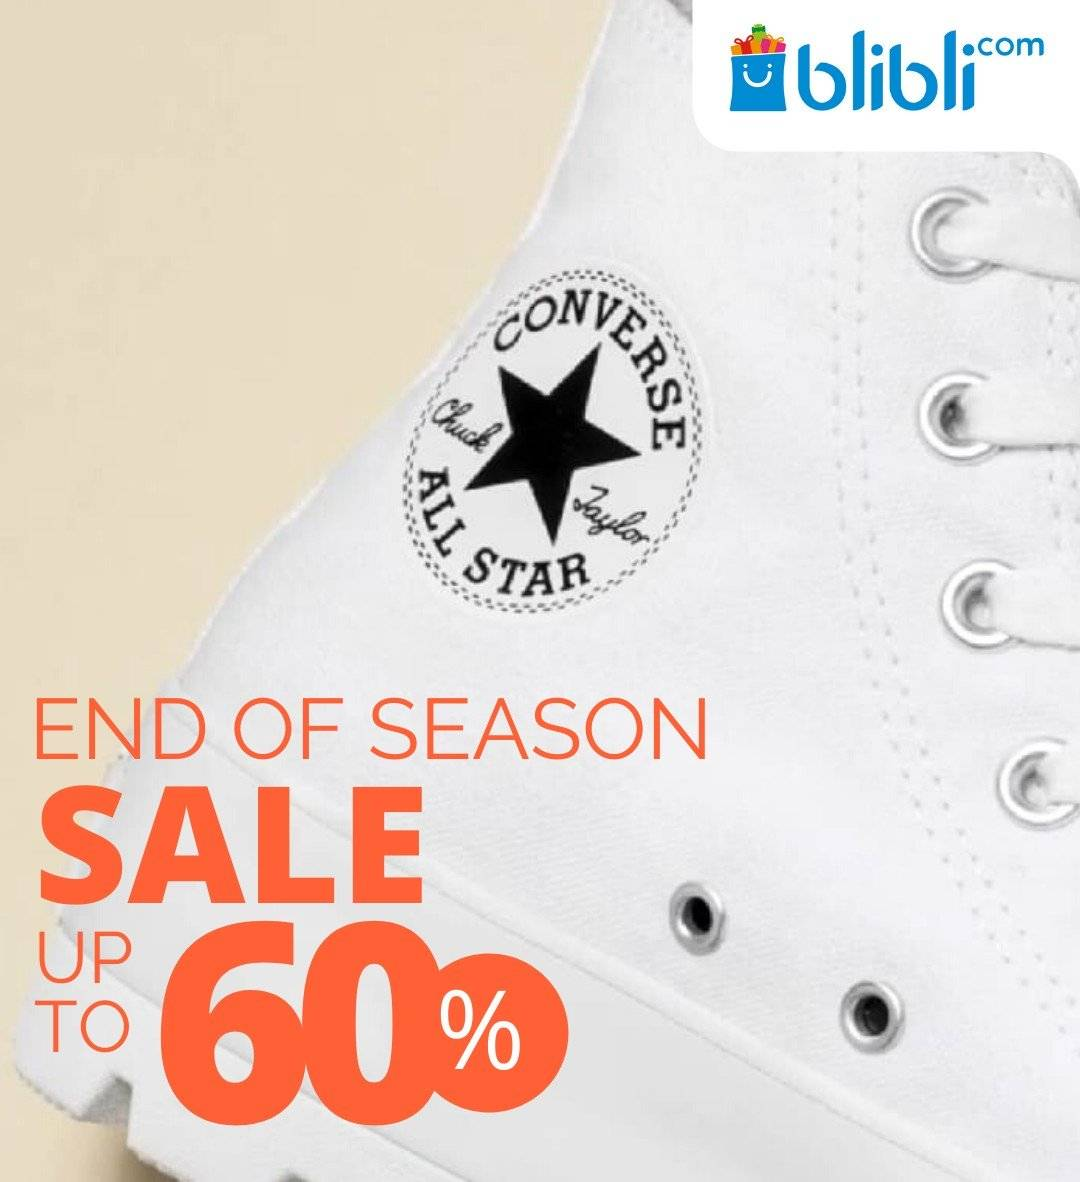 Blibli Promo Converse Year End Sale, Diskon Hingga 60%!